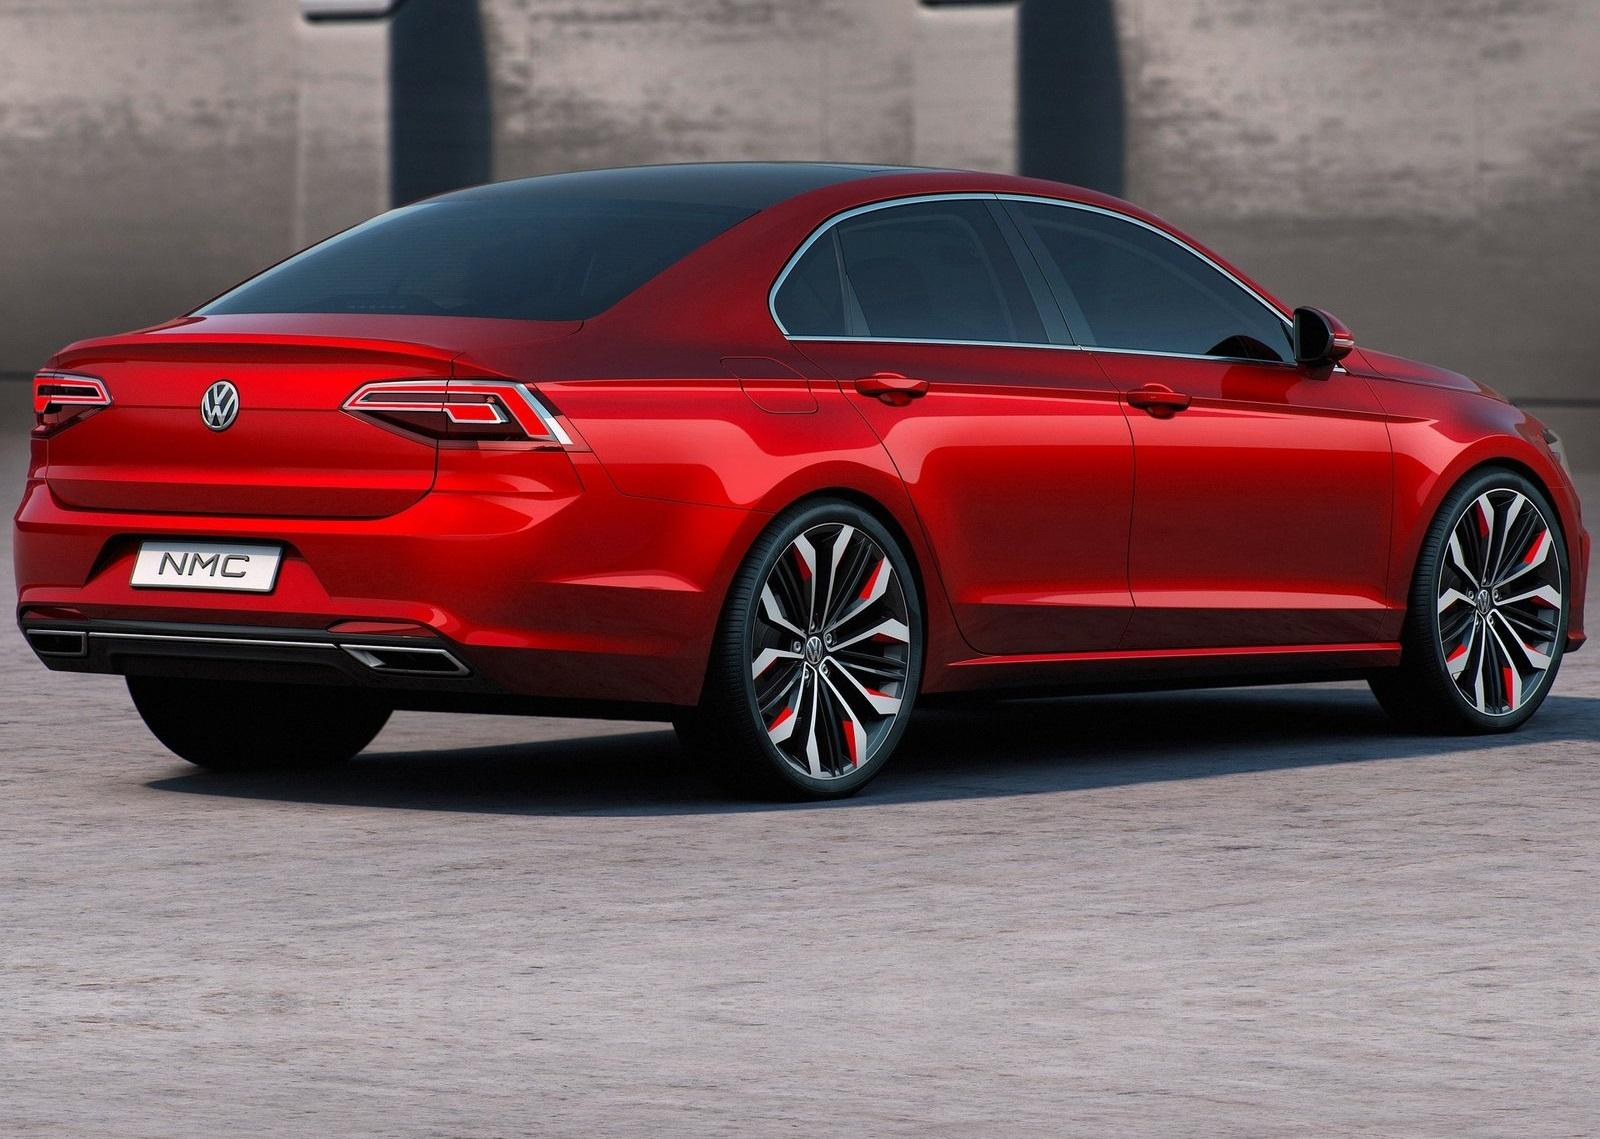 Volkswagen Jetta CC Will Enter Production in 2016